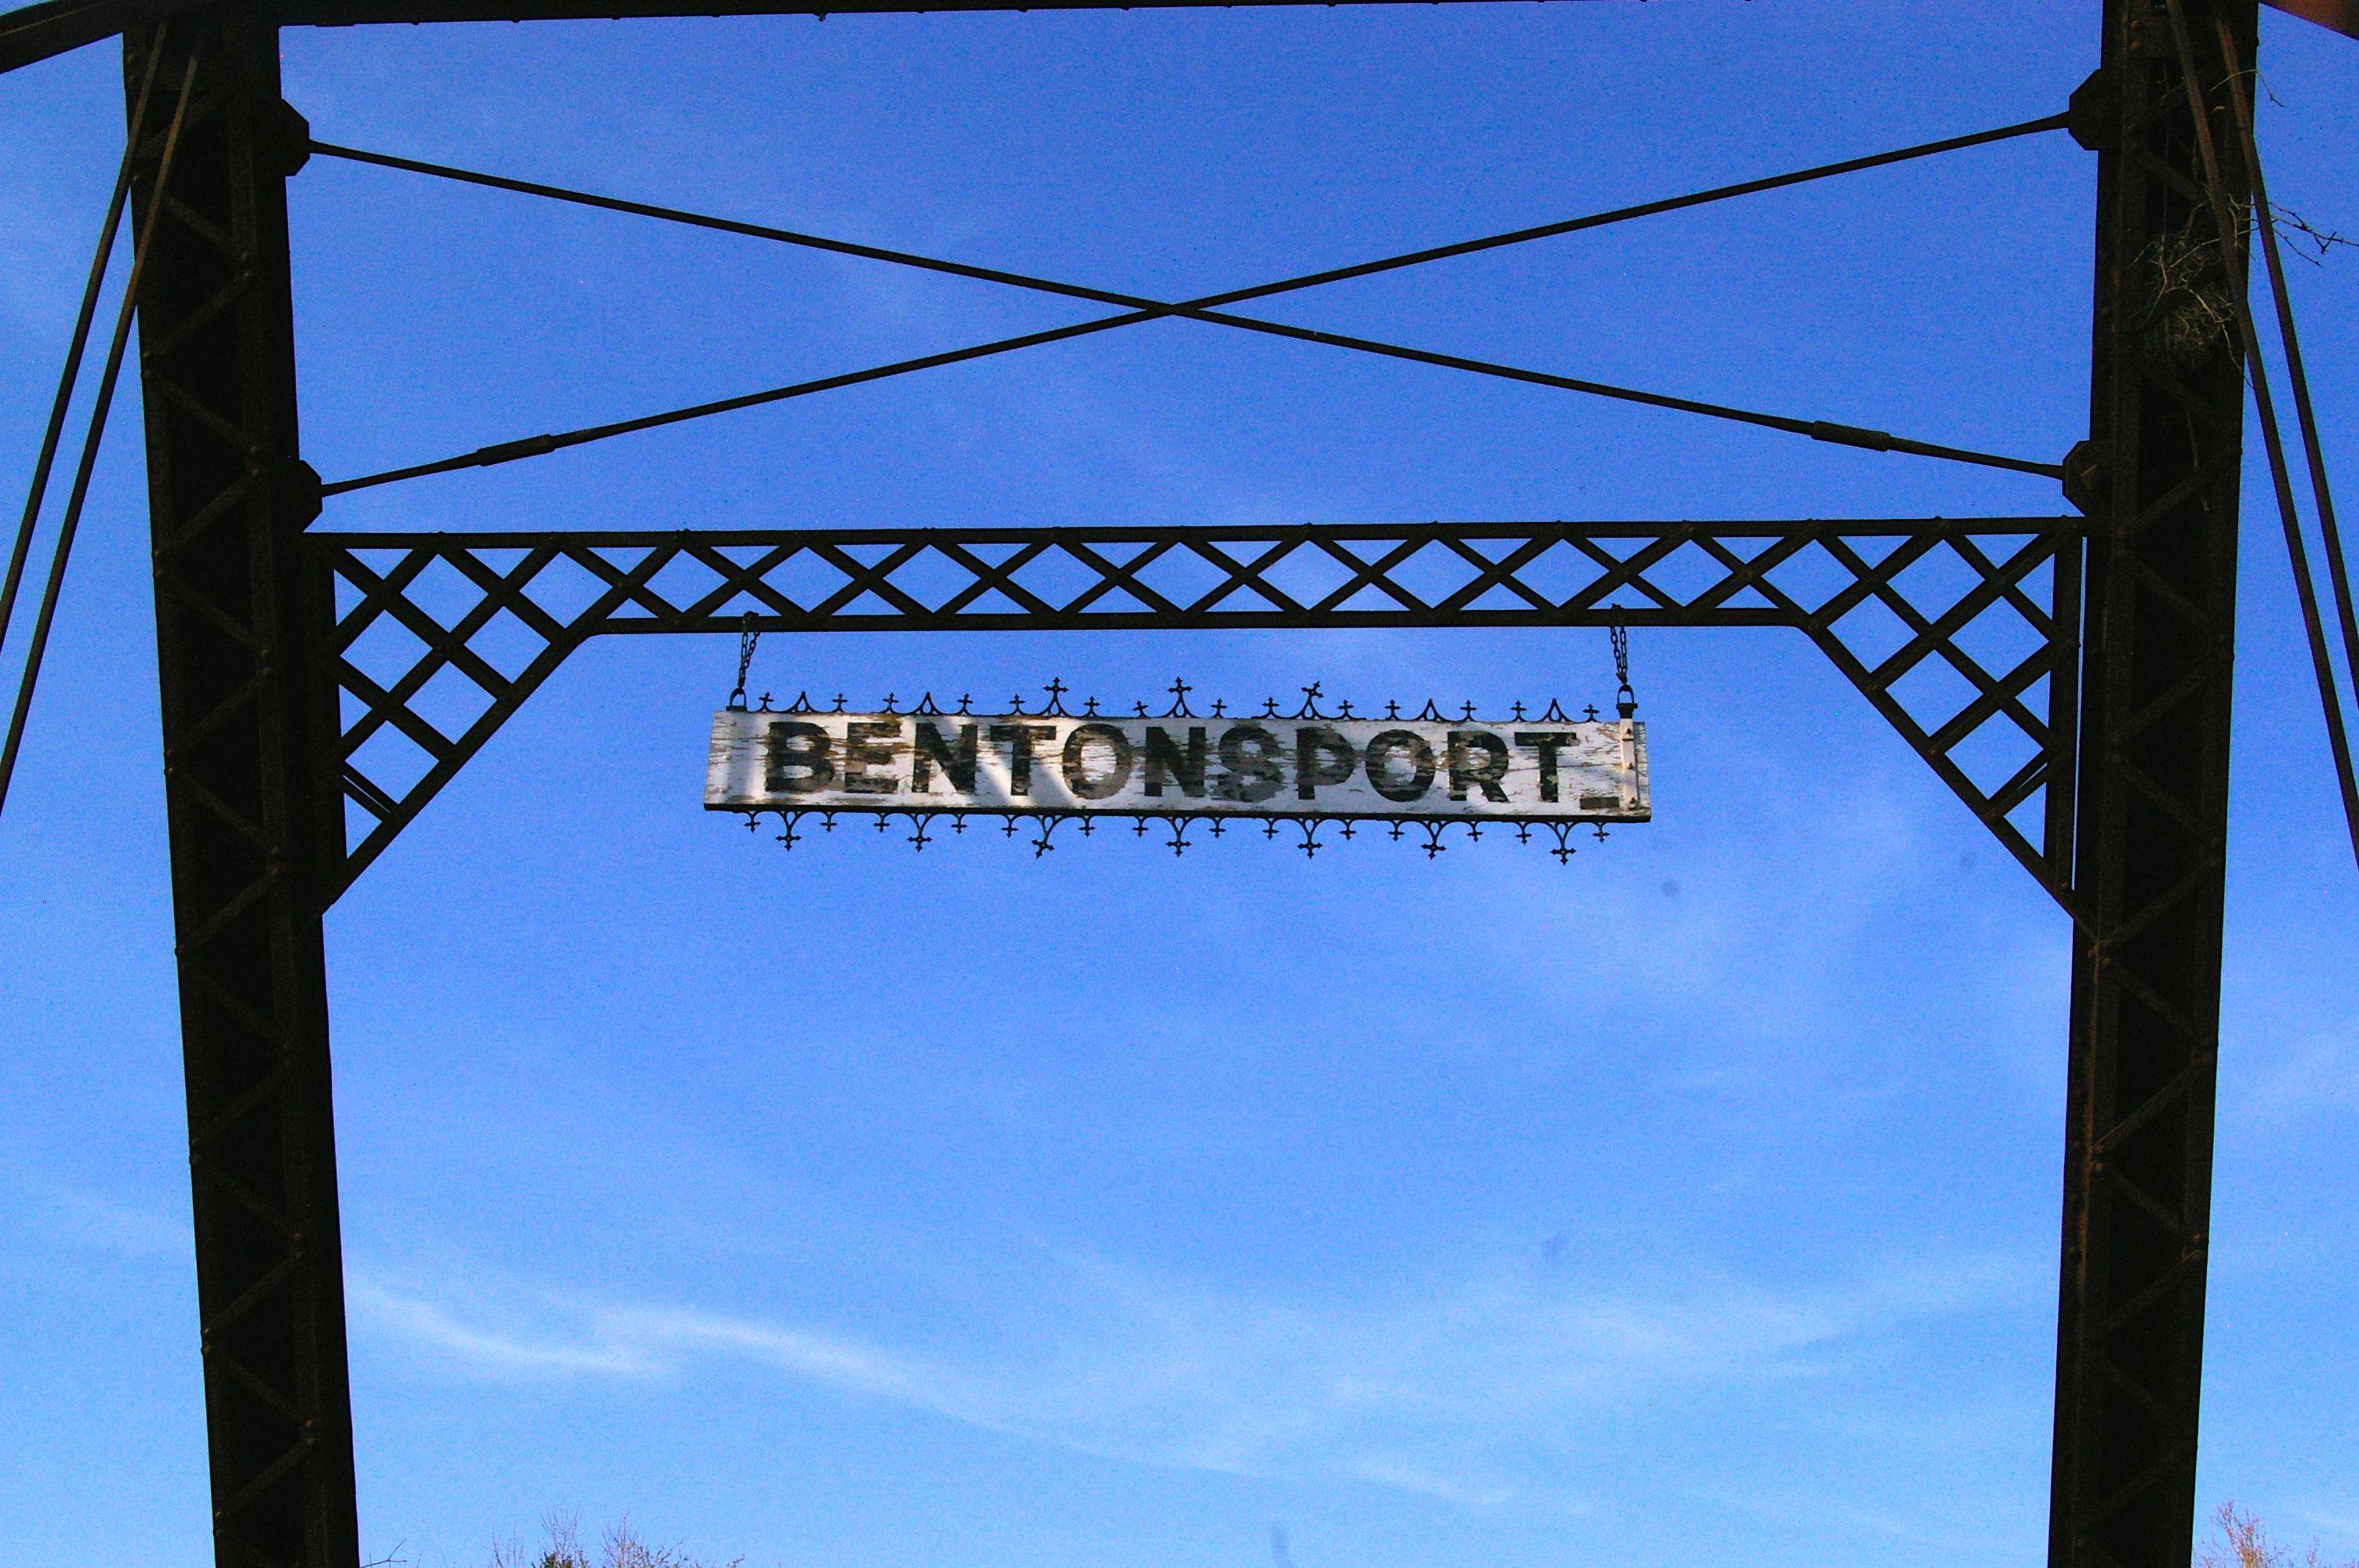 Bentonsport Iowa Map.A Walking Tour Of Bentonsport Iowa Iowa Bridge And Wander